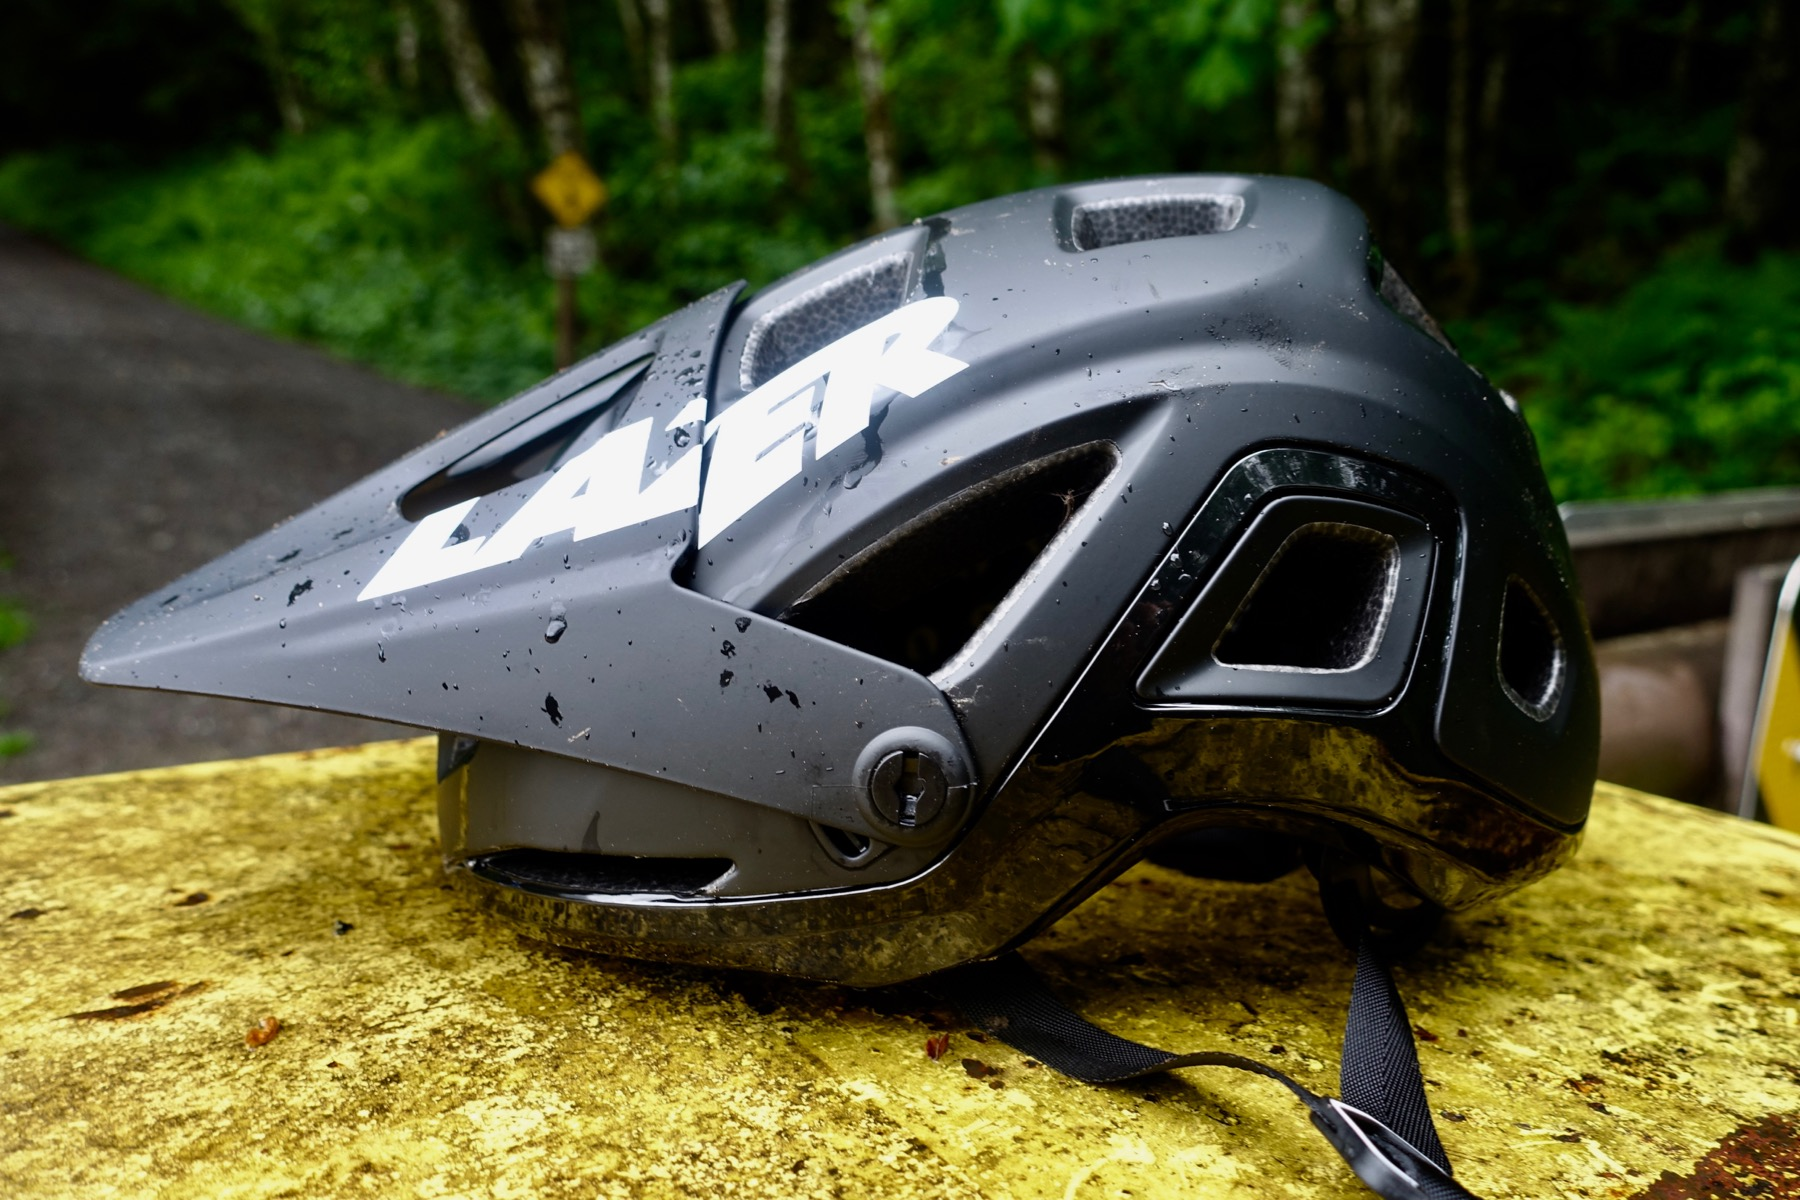 Lazer Impala Mountain Bike Helmet [Review] - Singletracks Mountain Bike News